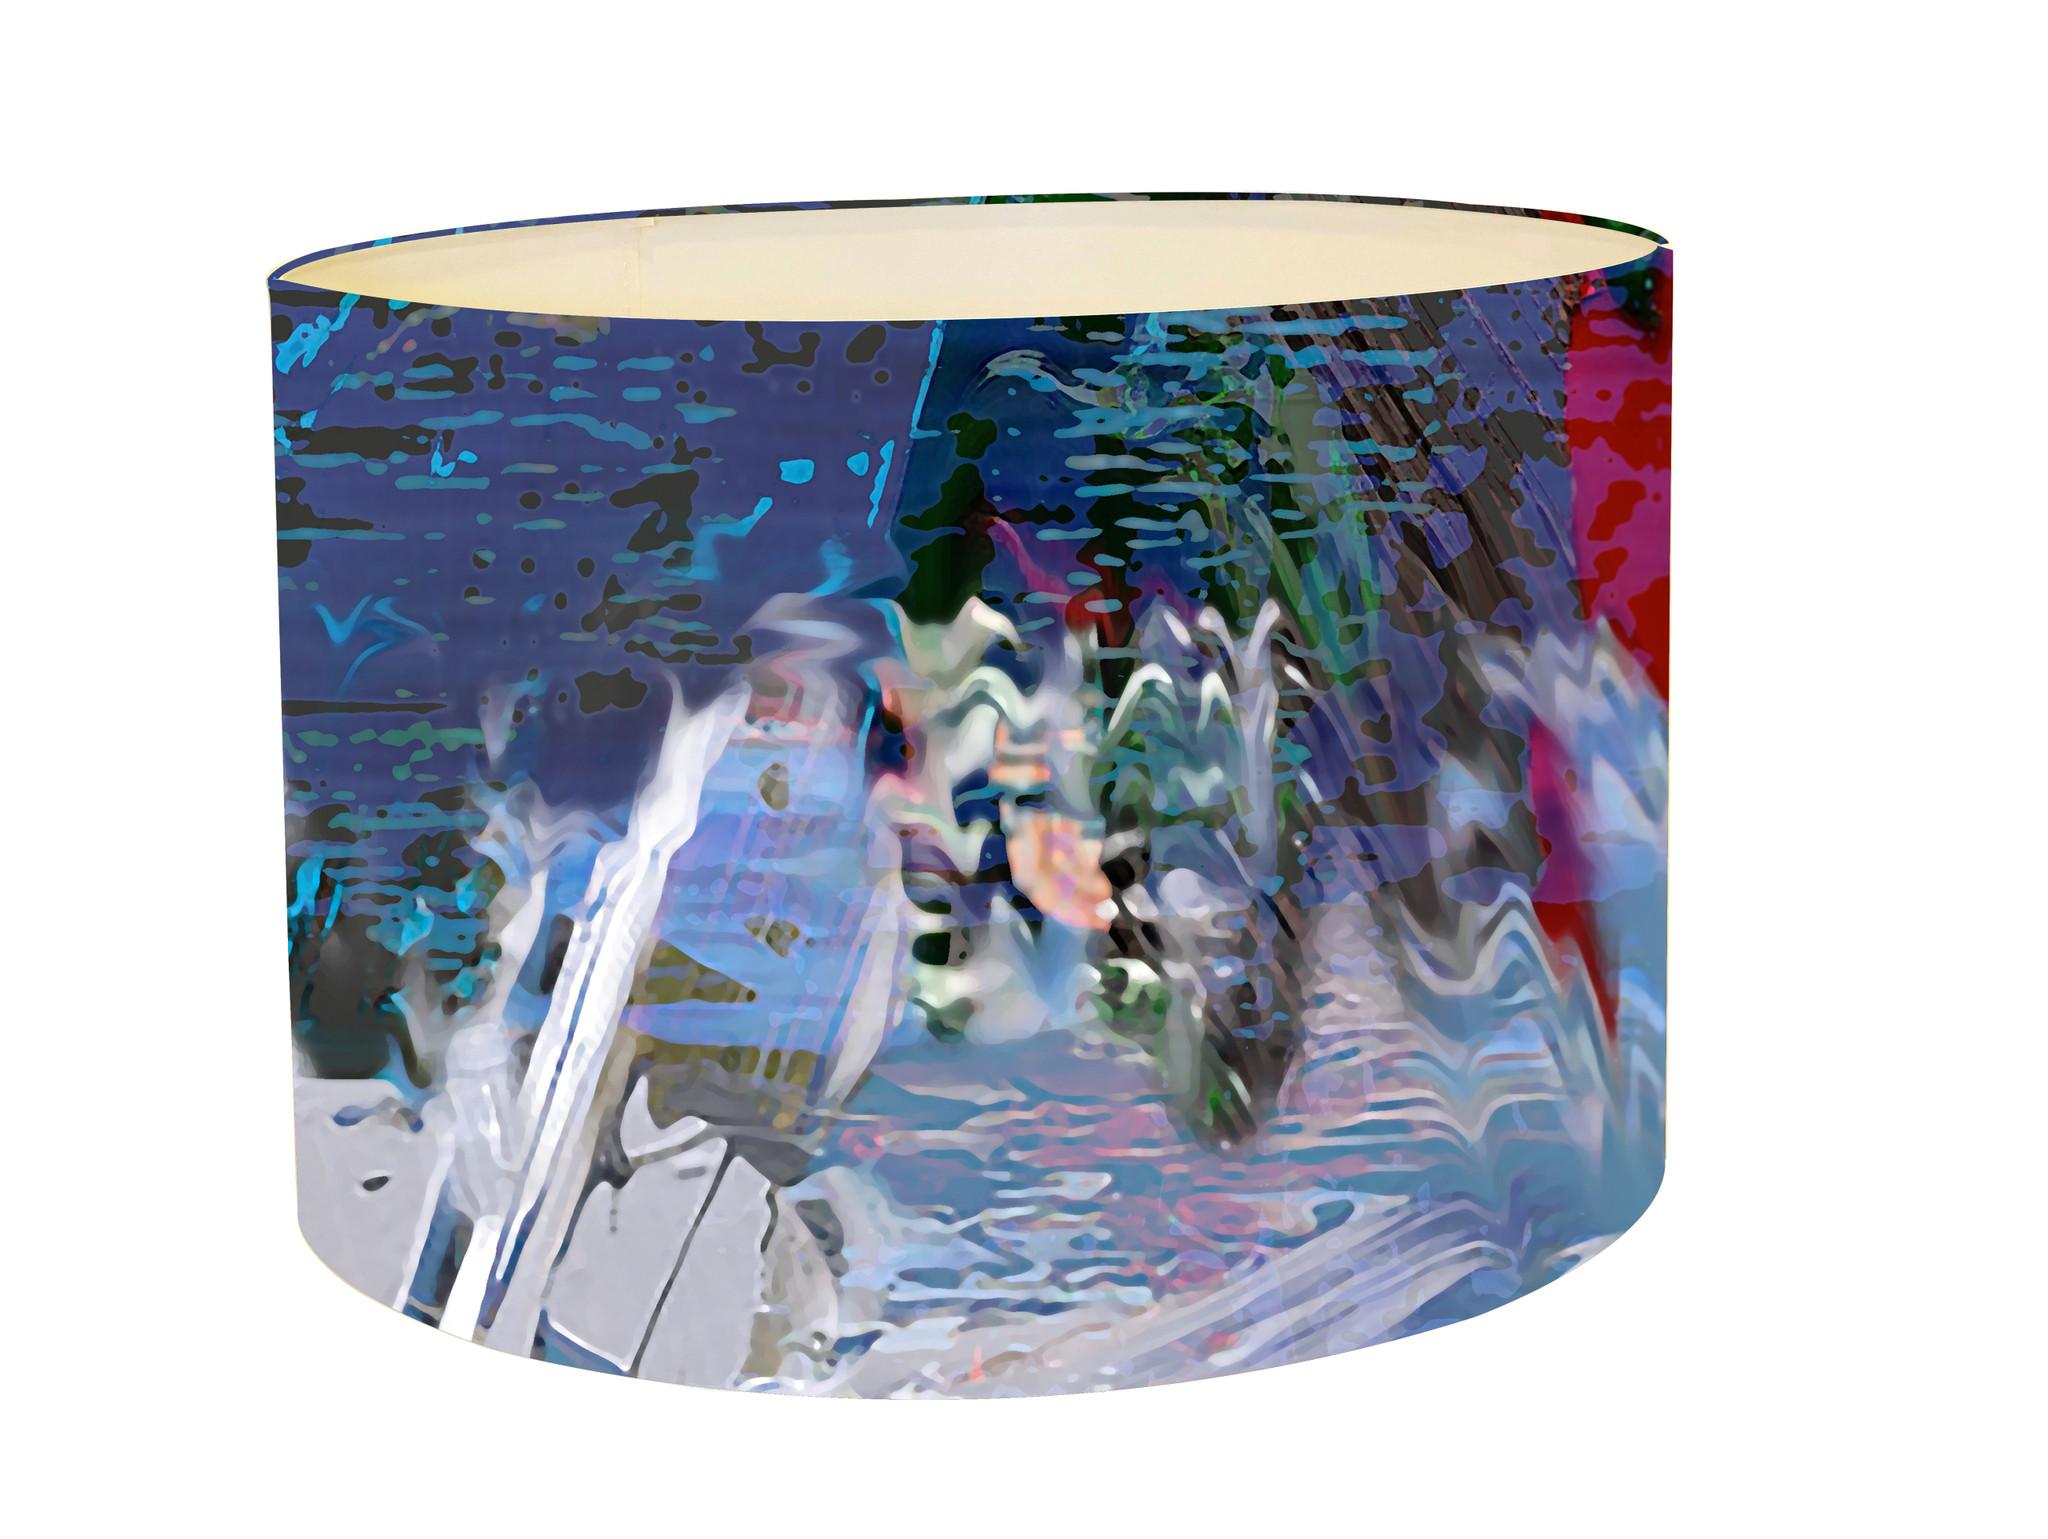 Lampshade - Blurred Vision - Blue Iris